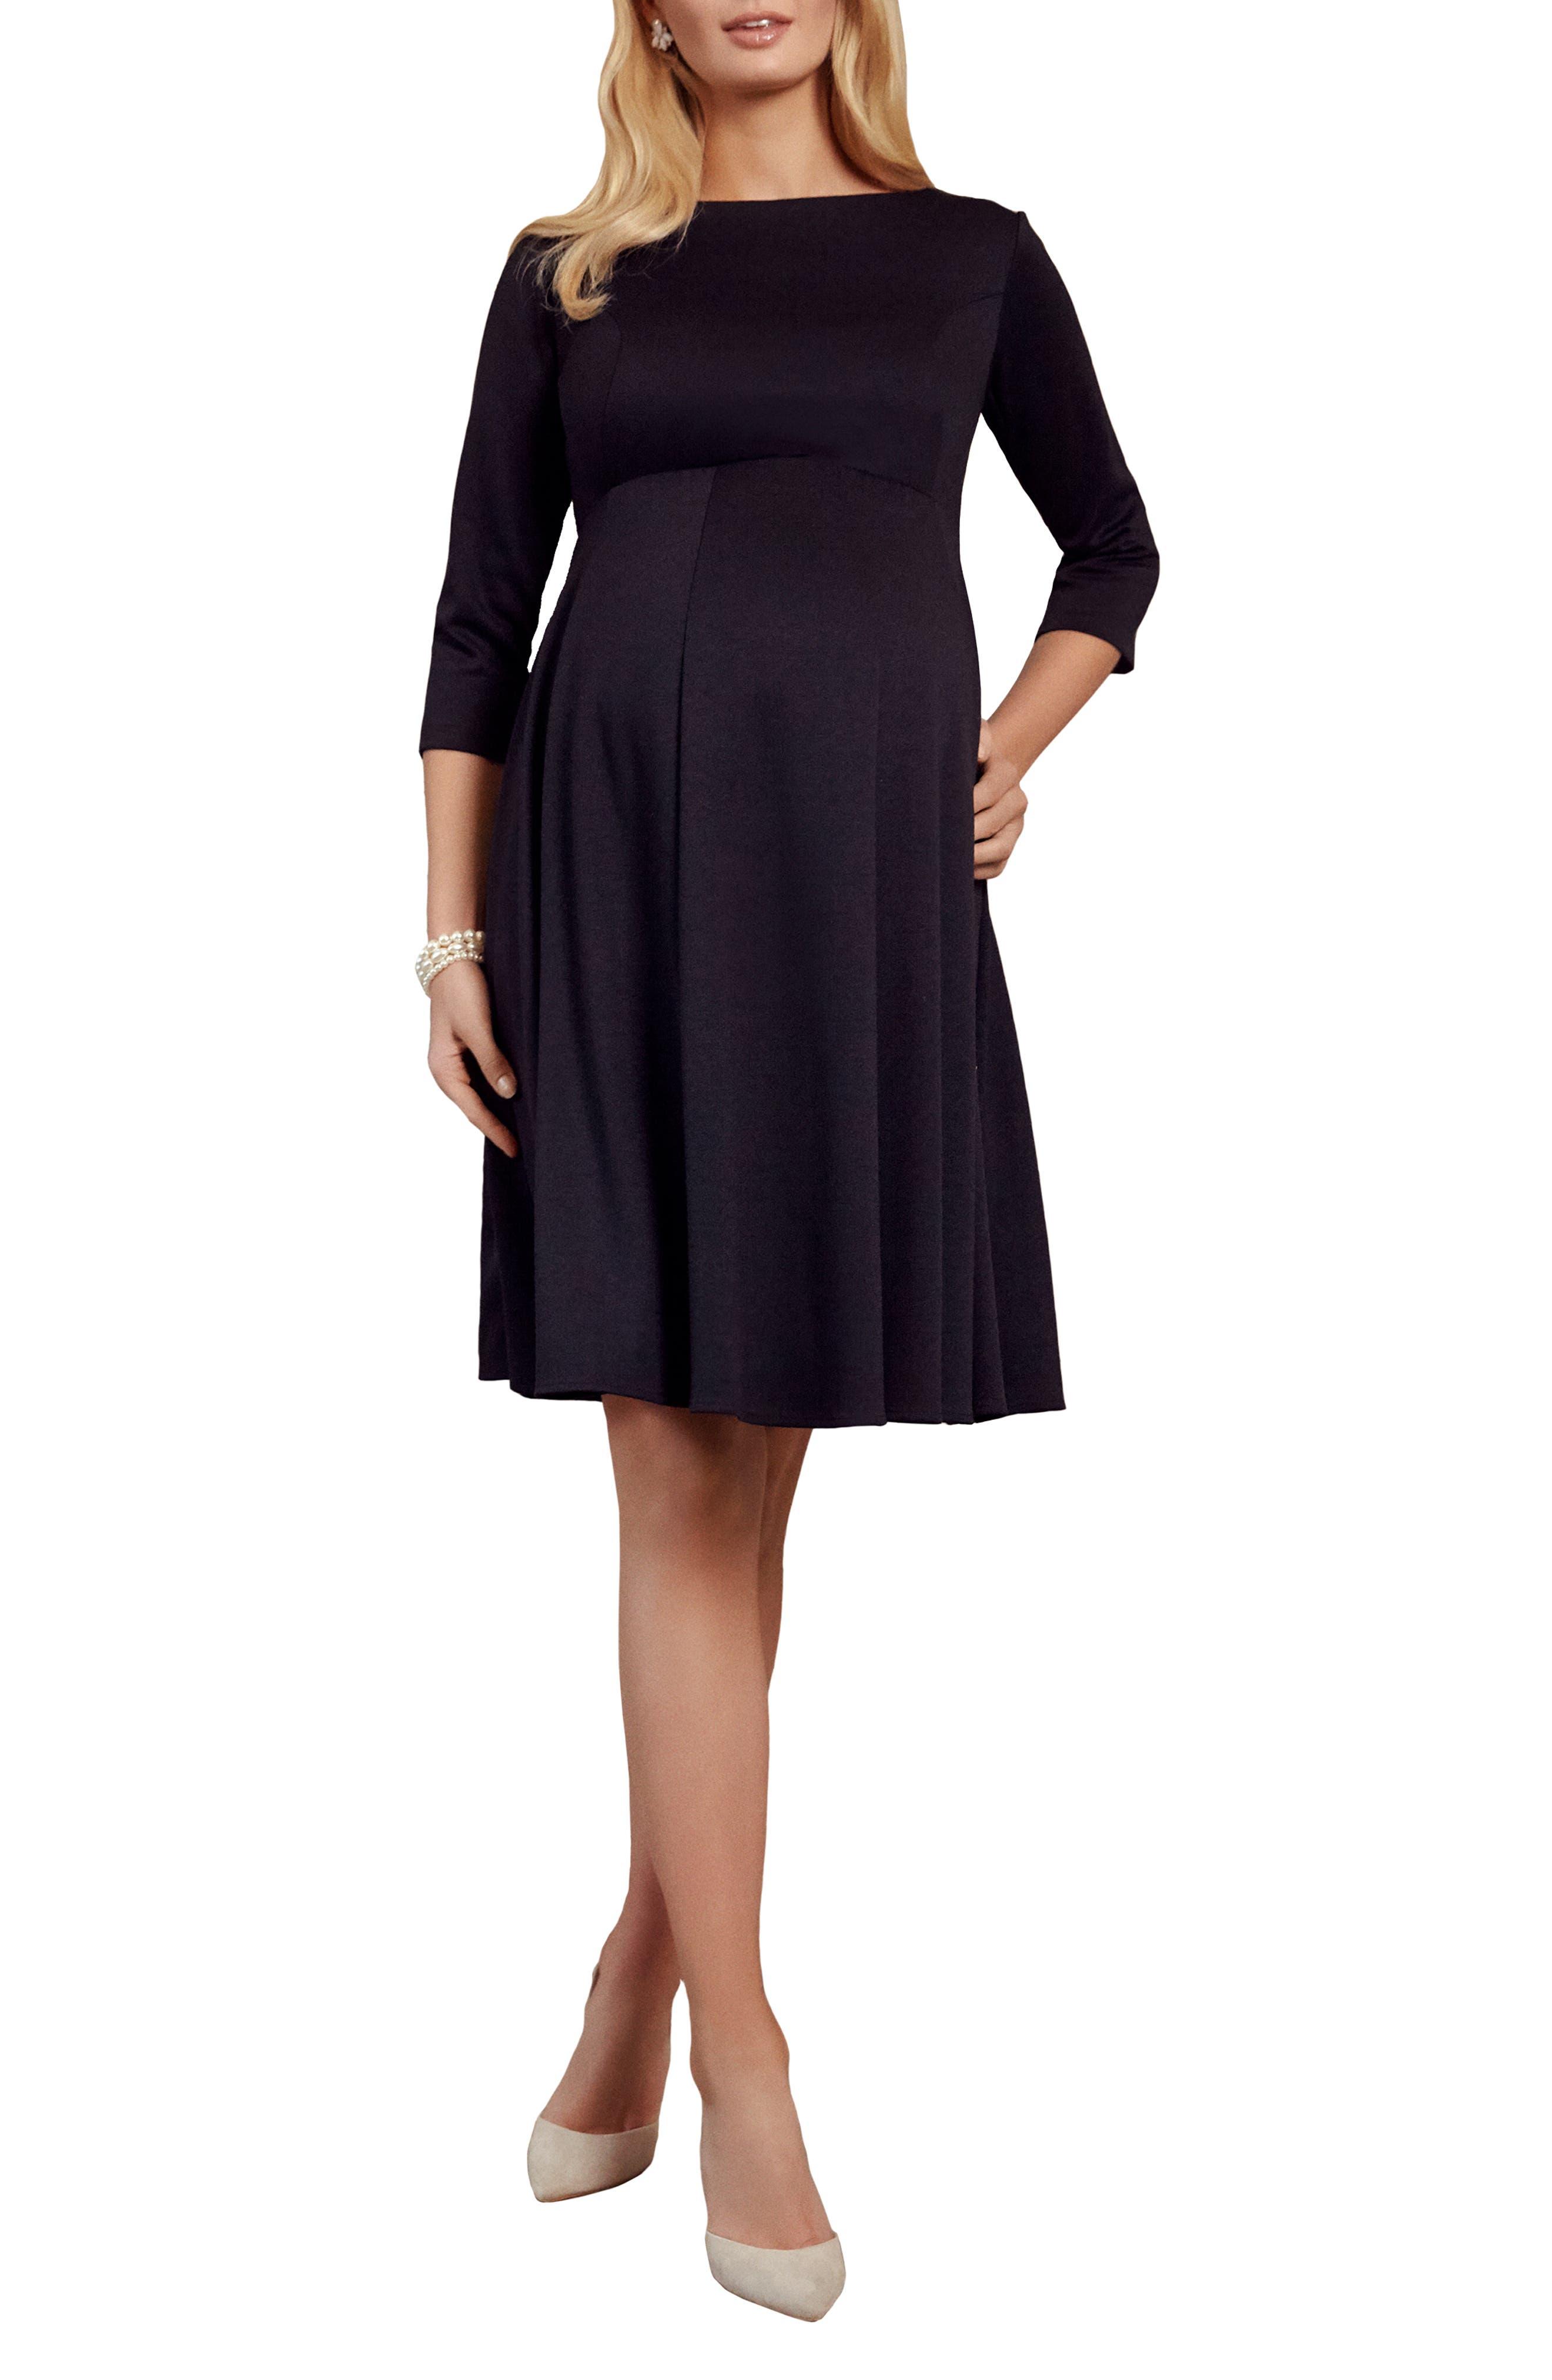 Tiffany Rose Sienna Maternity Dress, Black